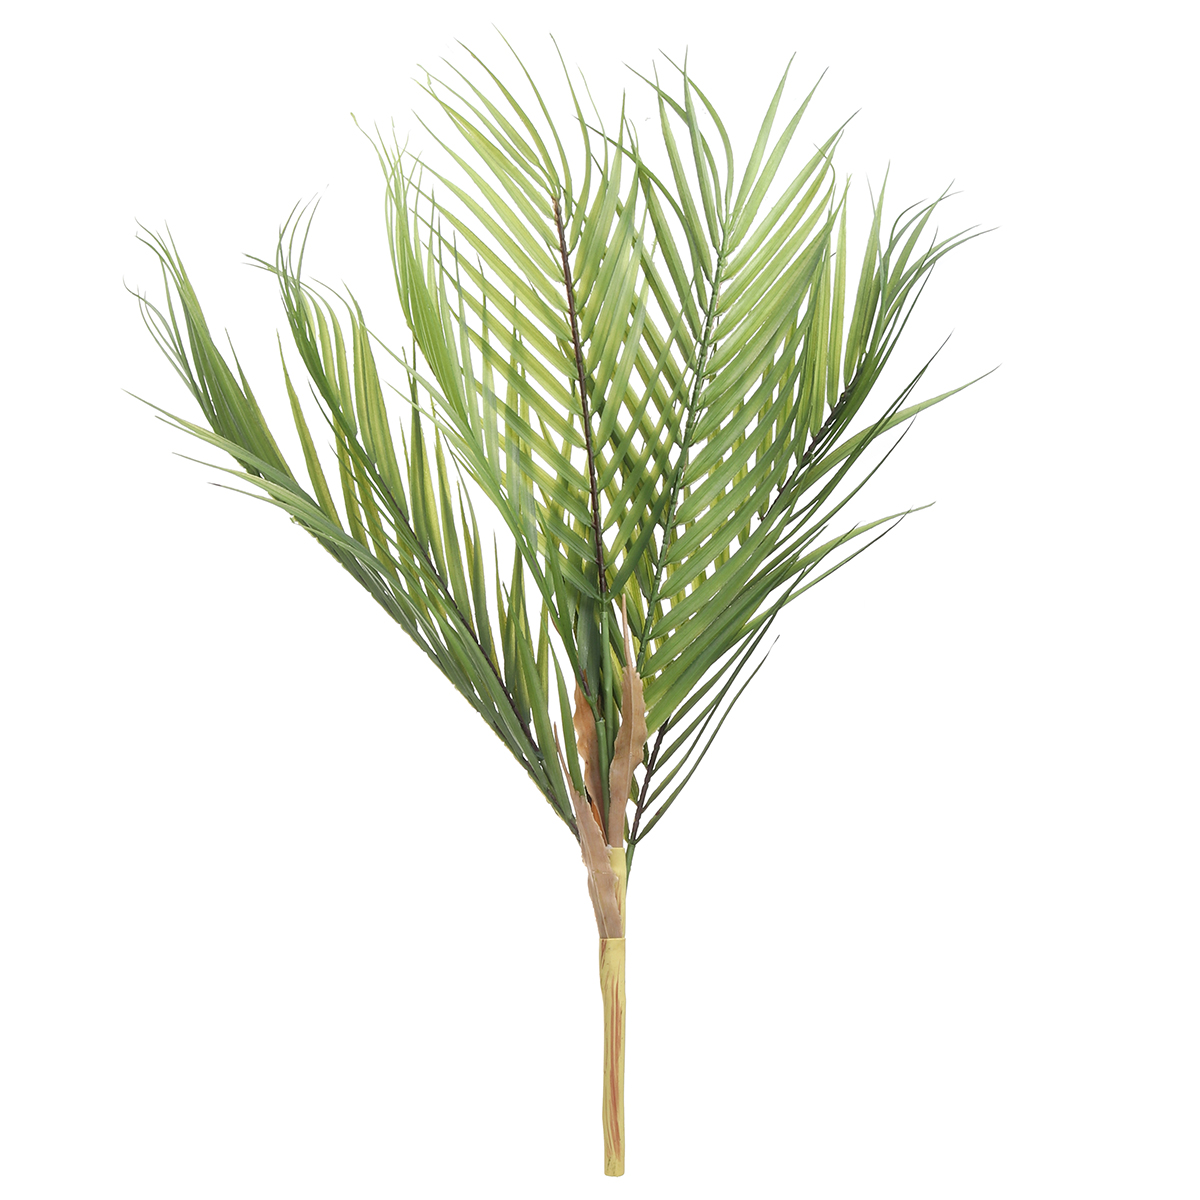 Palm Tree Artificial Leaves Branches Vivid Wild Foliage Plant For Home Wedding Living Room Diy Decoration Jungle Party Walmart Com Walmart Com